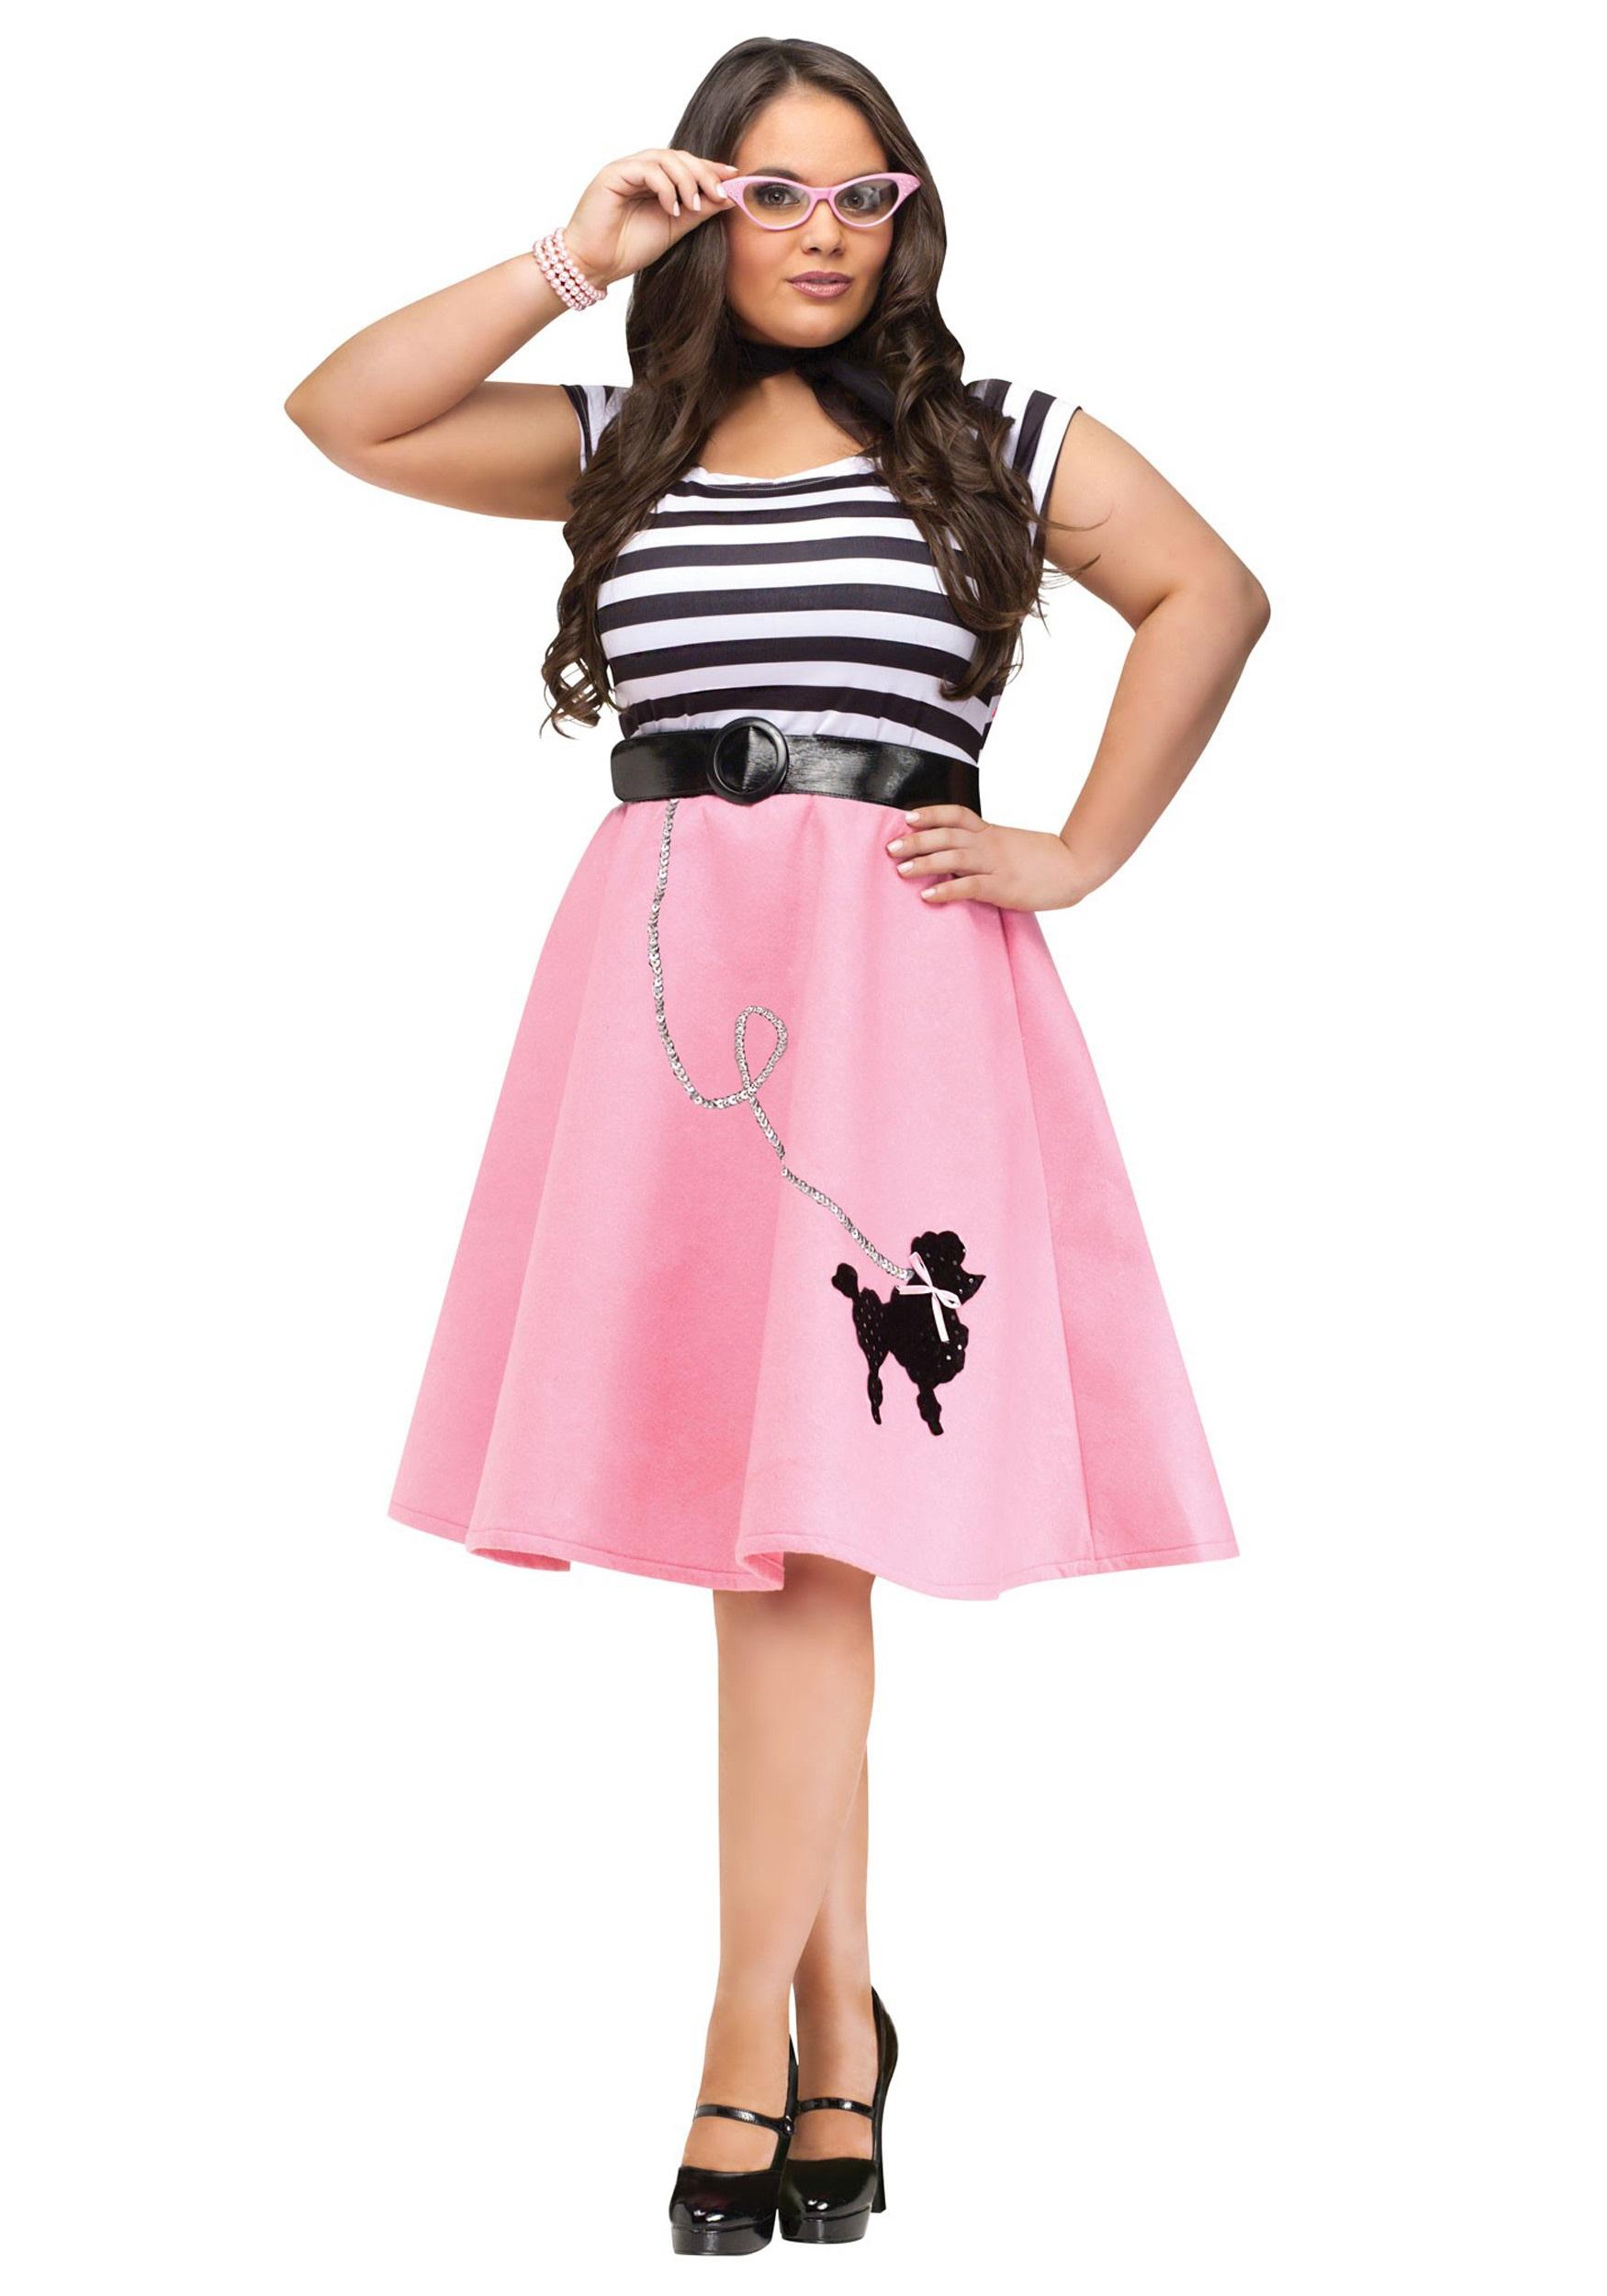 Plus Size Poodle Skirt Dress  sc 1 st  Halloween Costumes & Plus Size Poodle Skirt Dress - Halloween Costumes